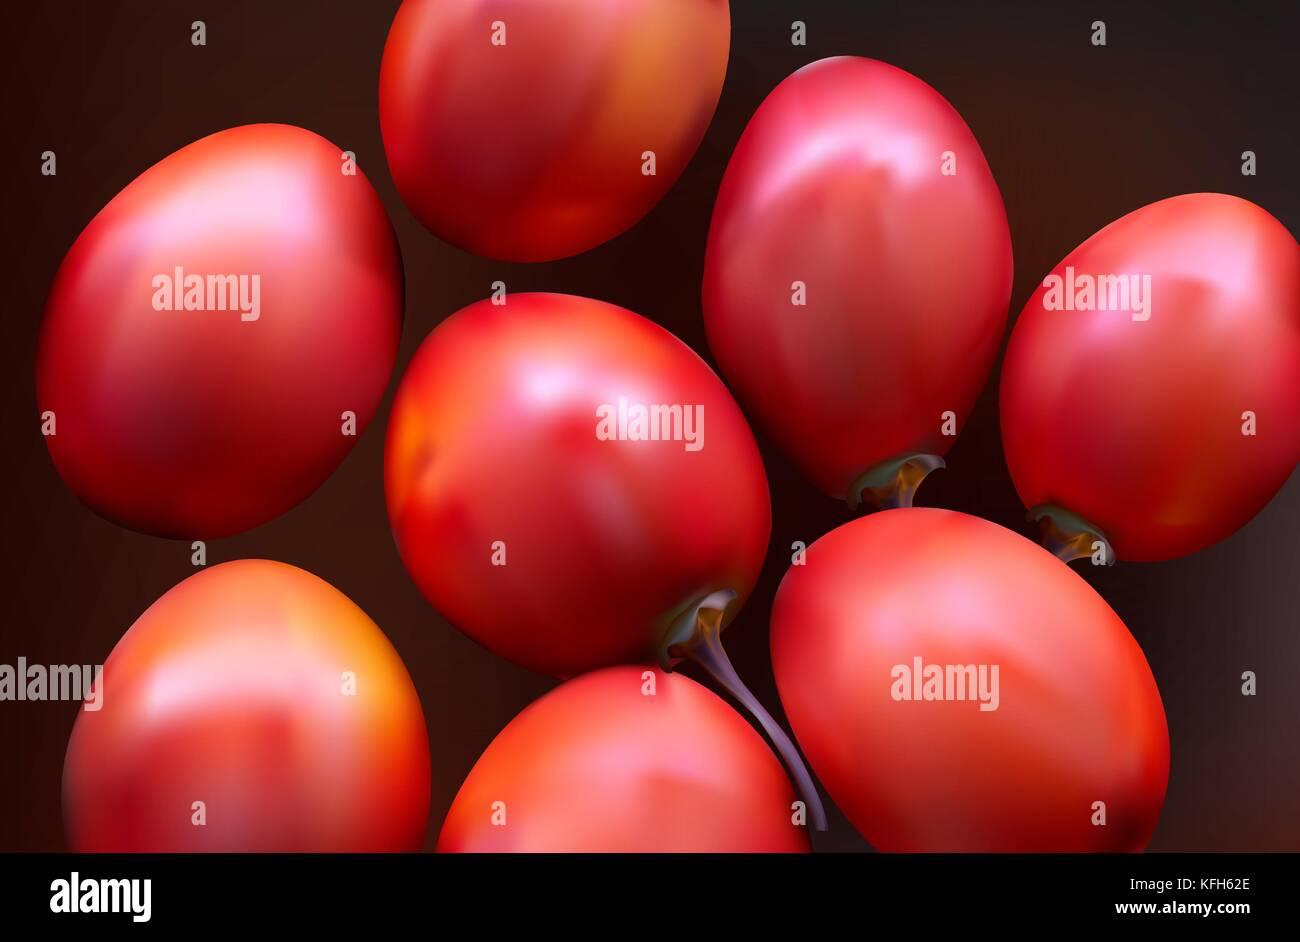 New Zealand evergreen tree fruit vegetable, Tamarillo - Stock Vector